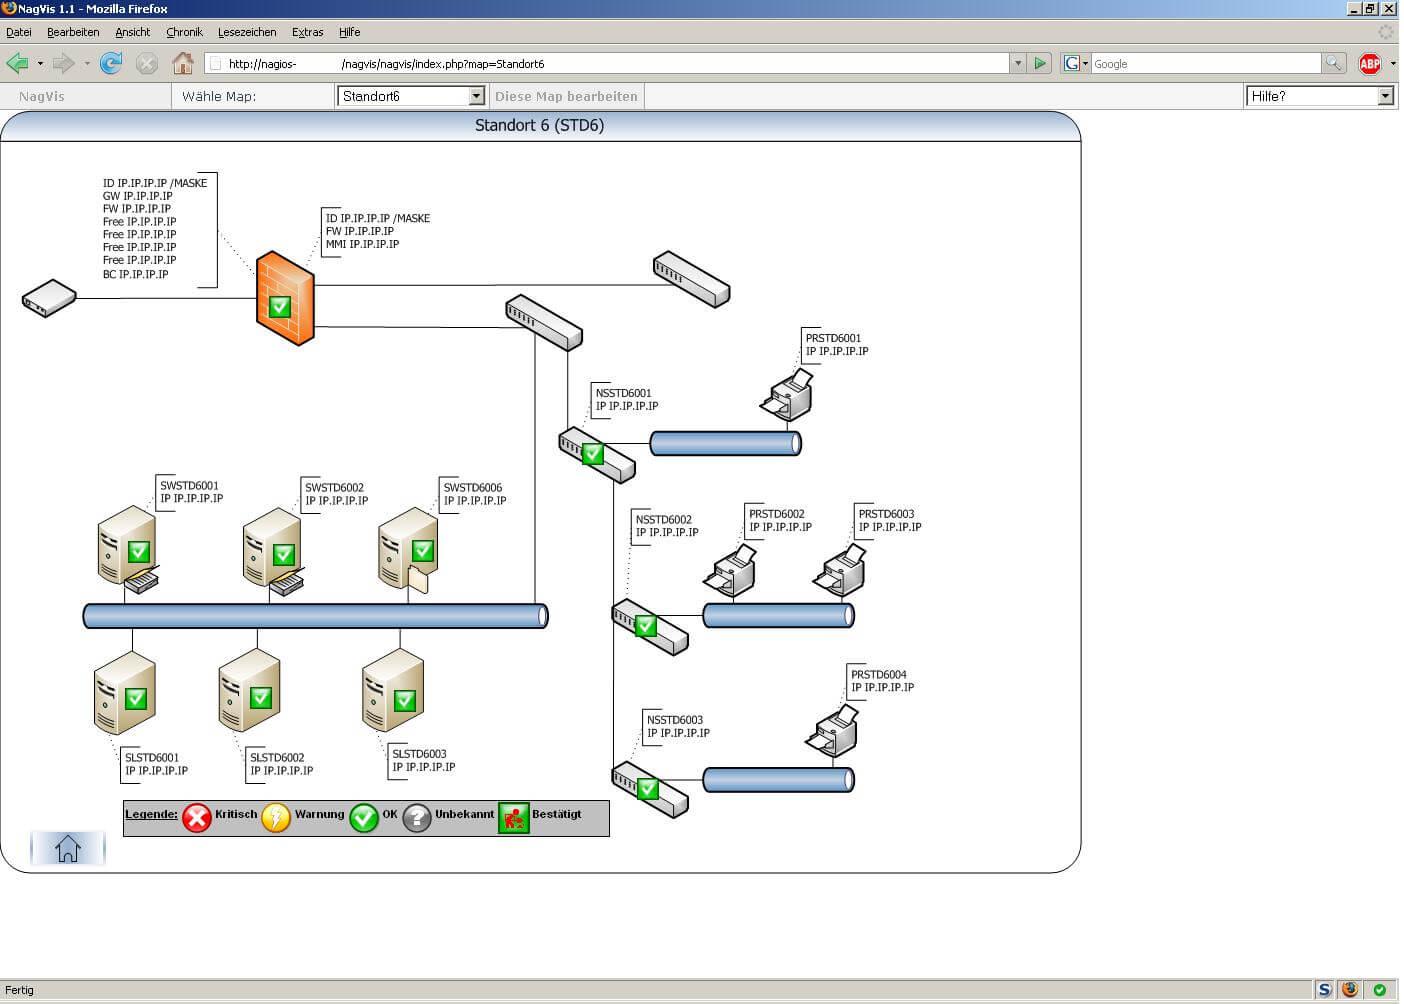 Check MK Monitoriza tus recursos TI con código abierto -Ejemplo NagVis